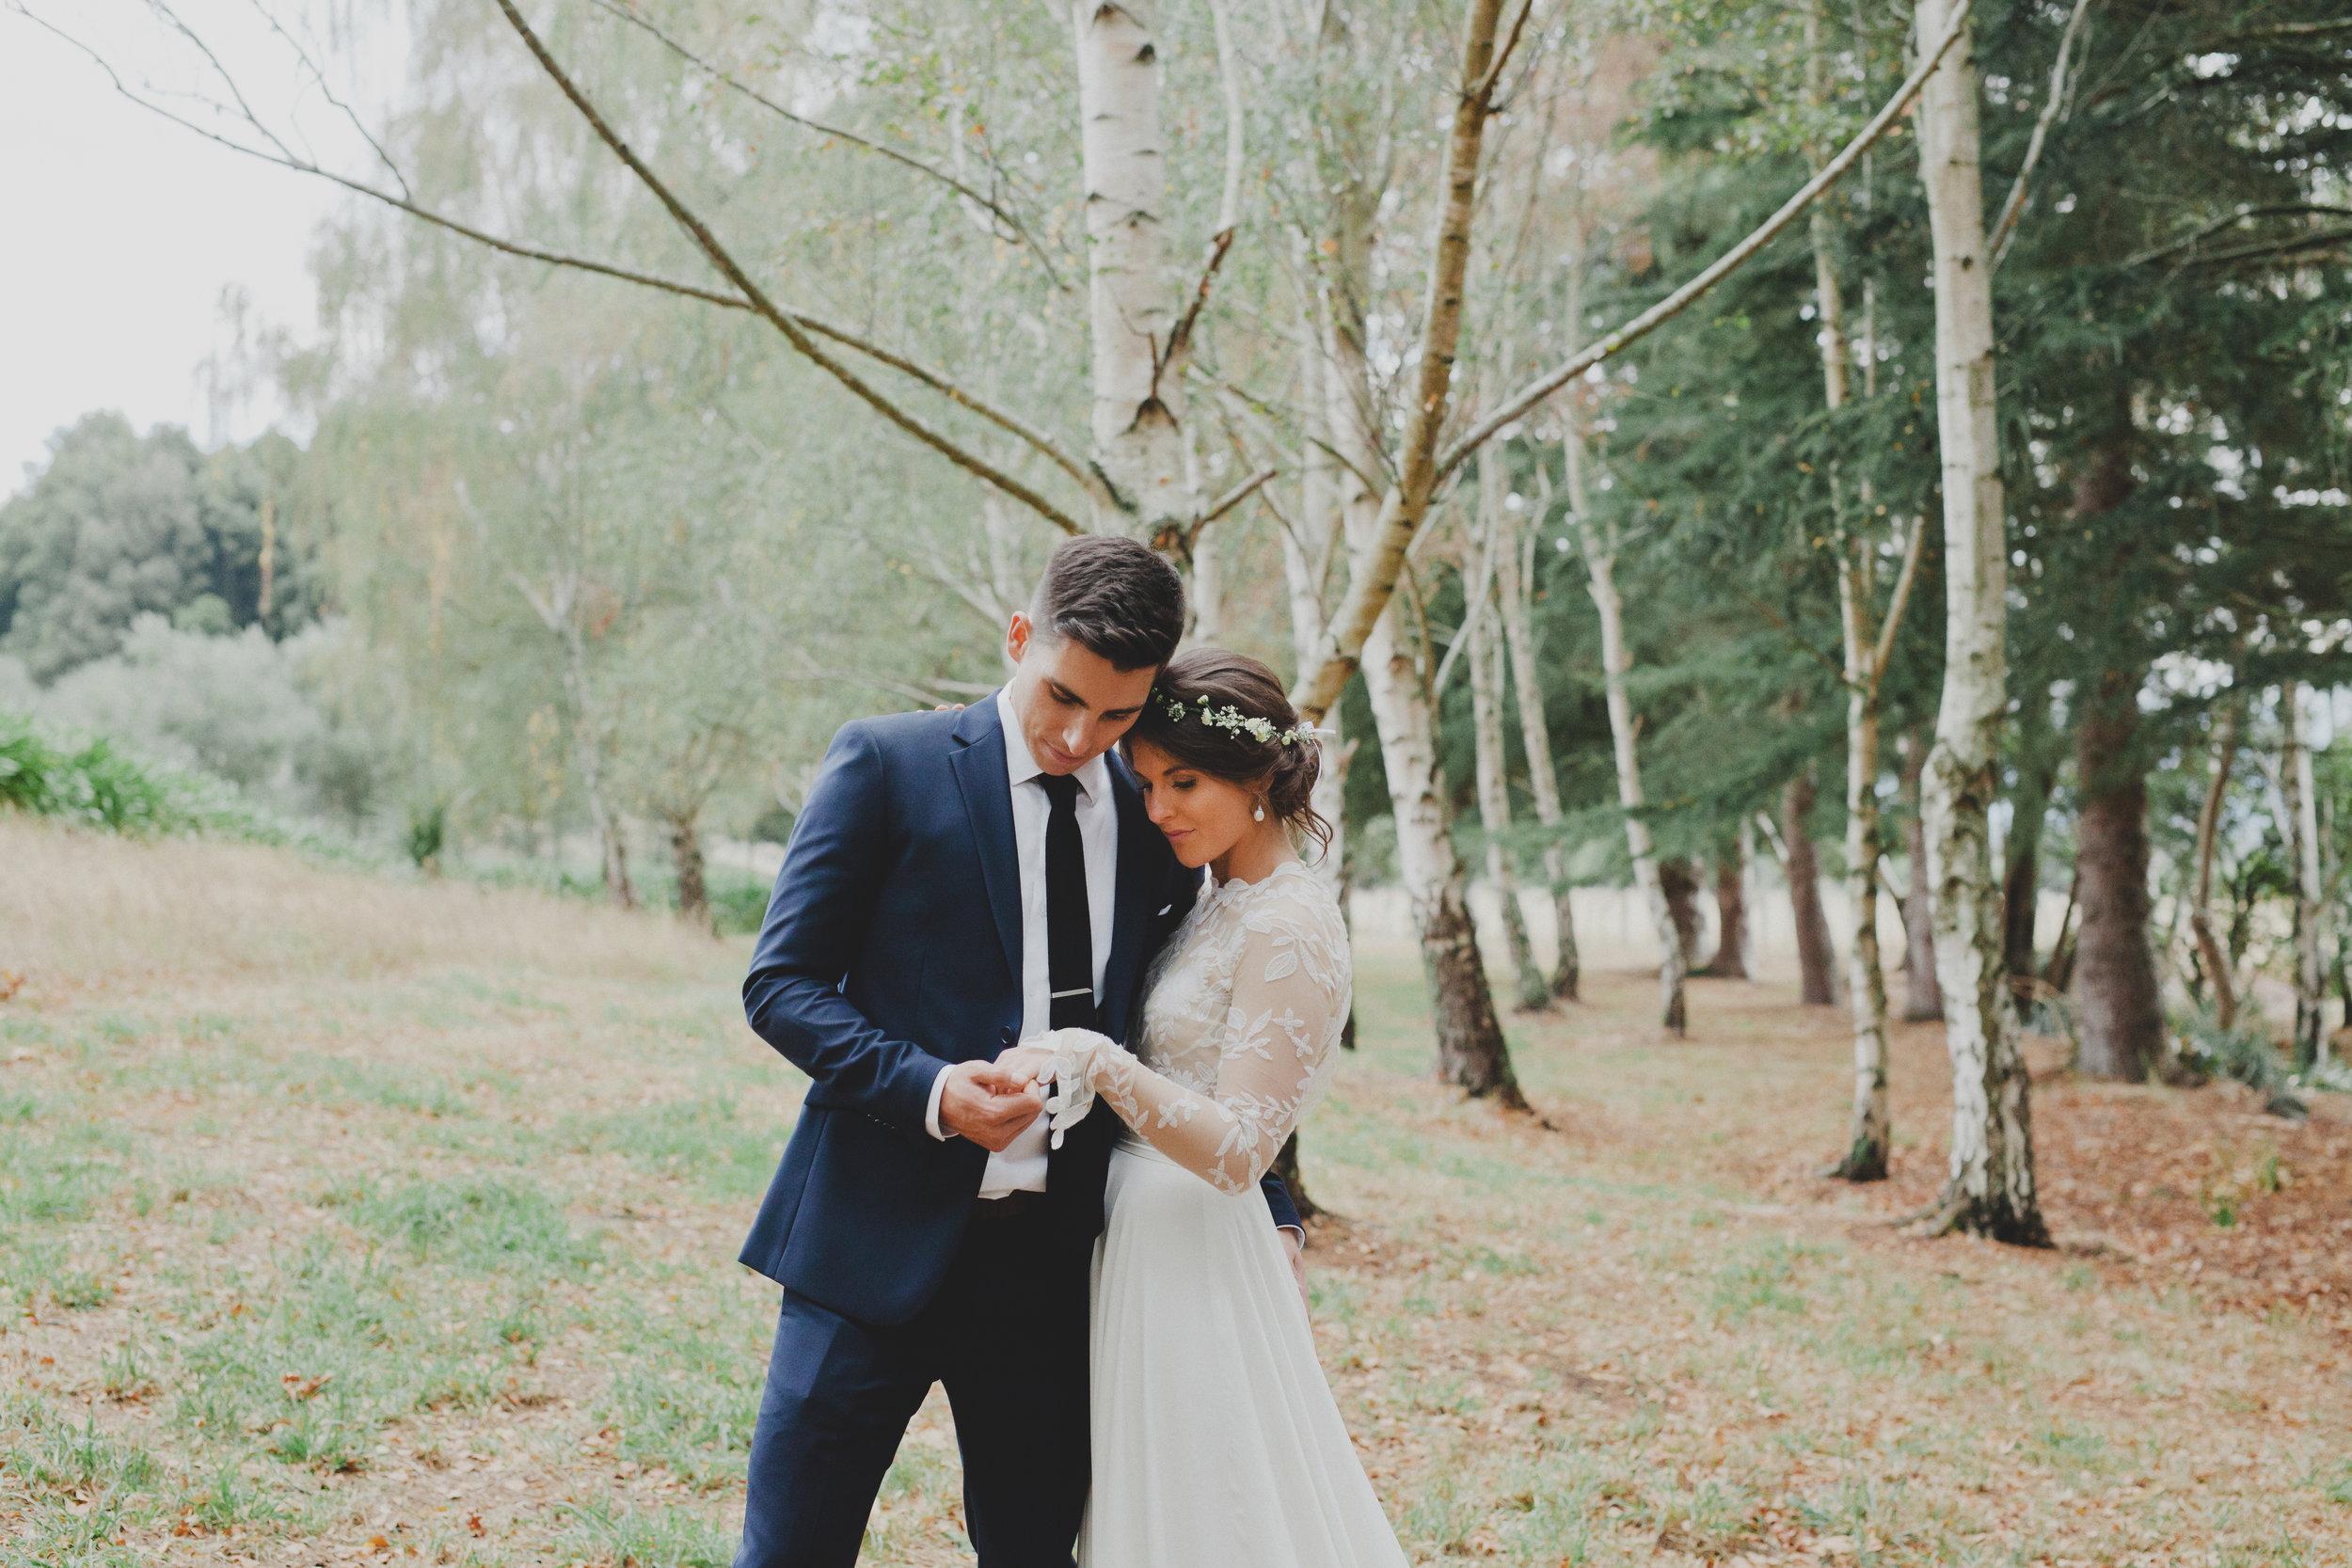 wellington wedding photography NZ - 1100.JPG